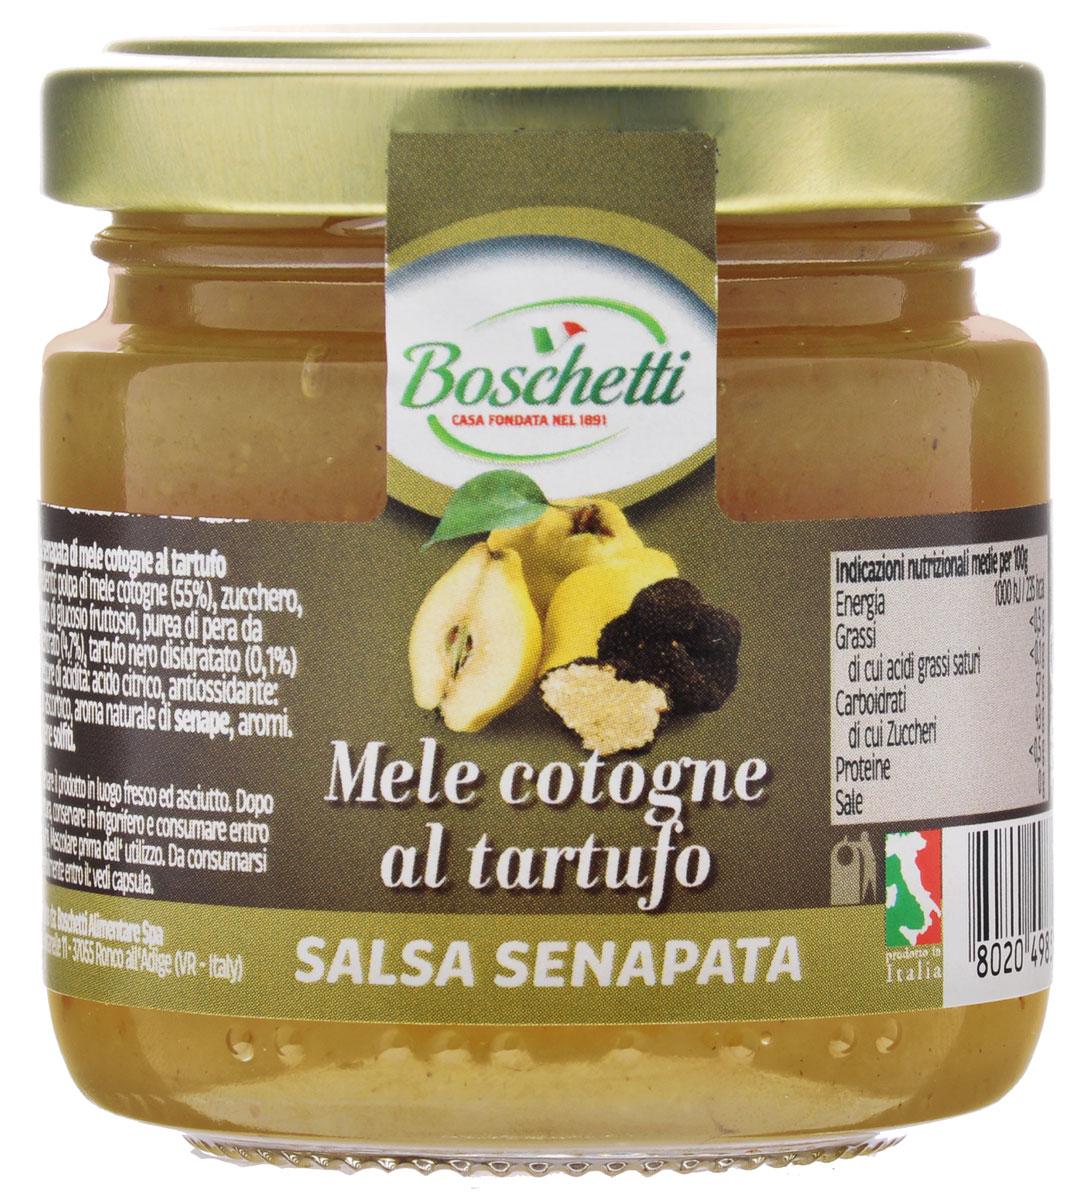 Boschetti Mele cotogne al tartufo соус сальса, 120 г SP#TC35AY